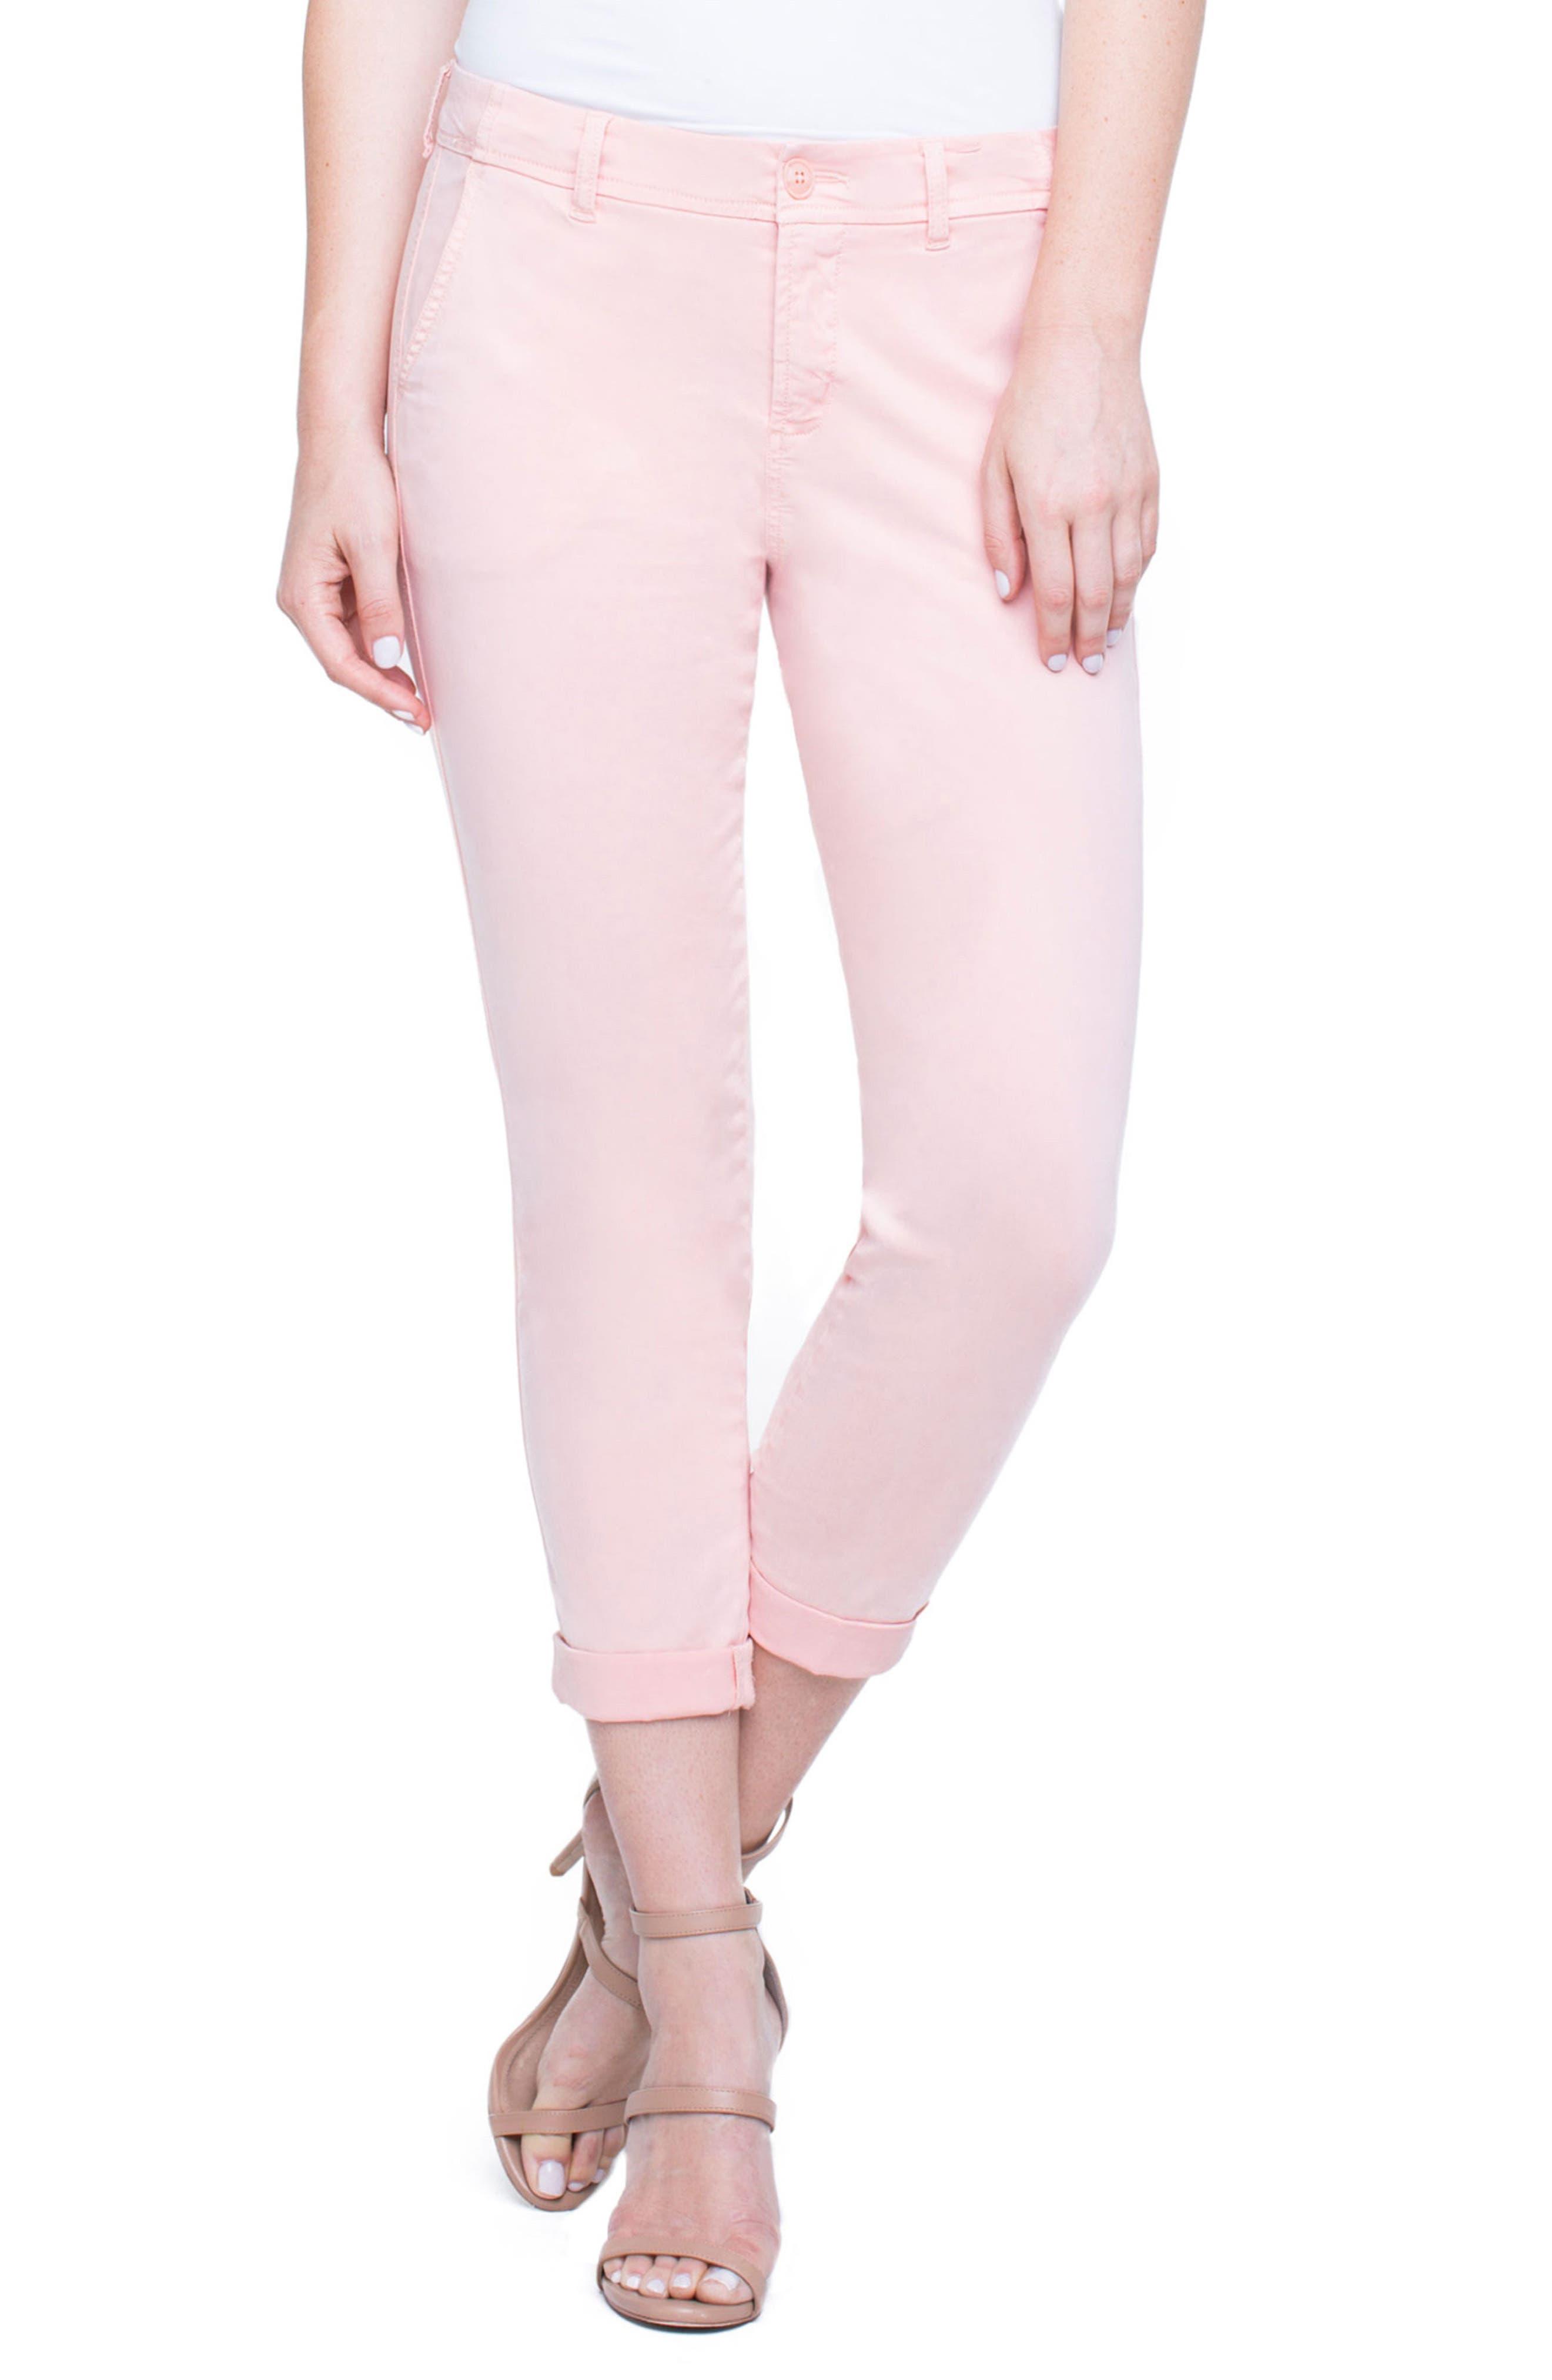 Buddy Pants,                         Main,                         color, Bombay Pink